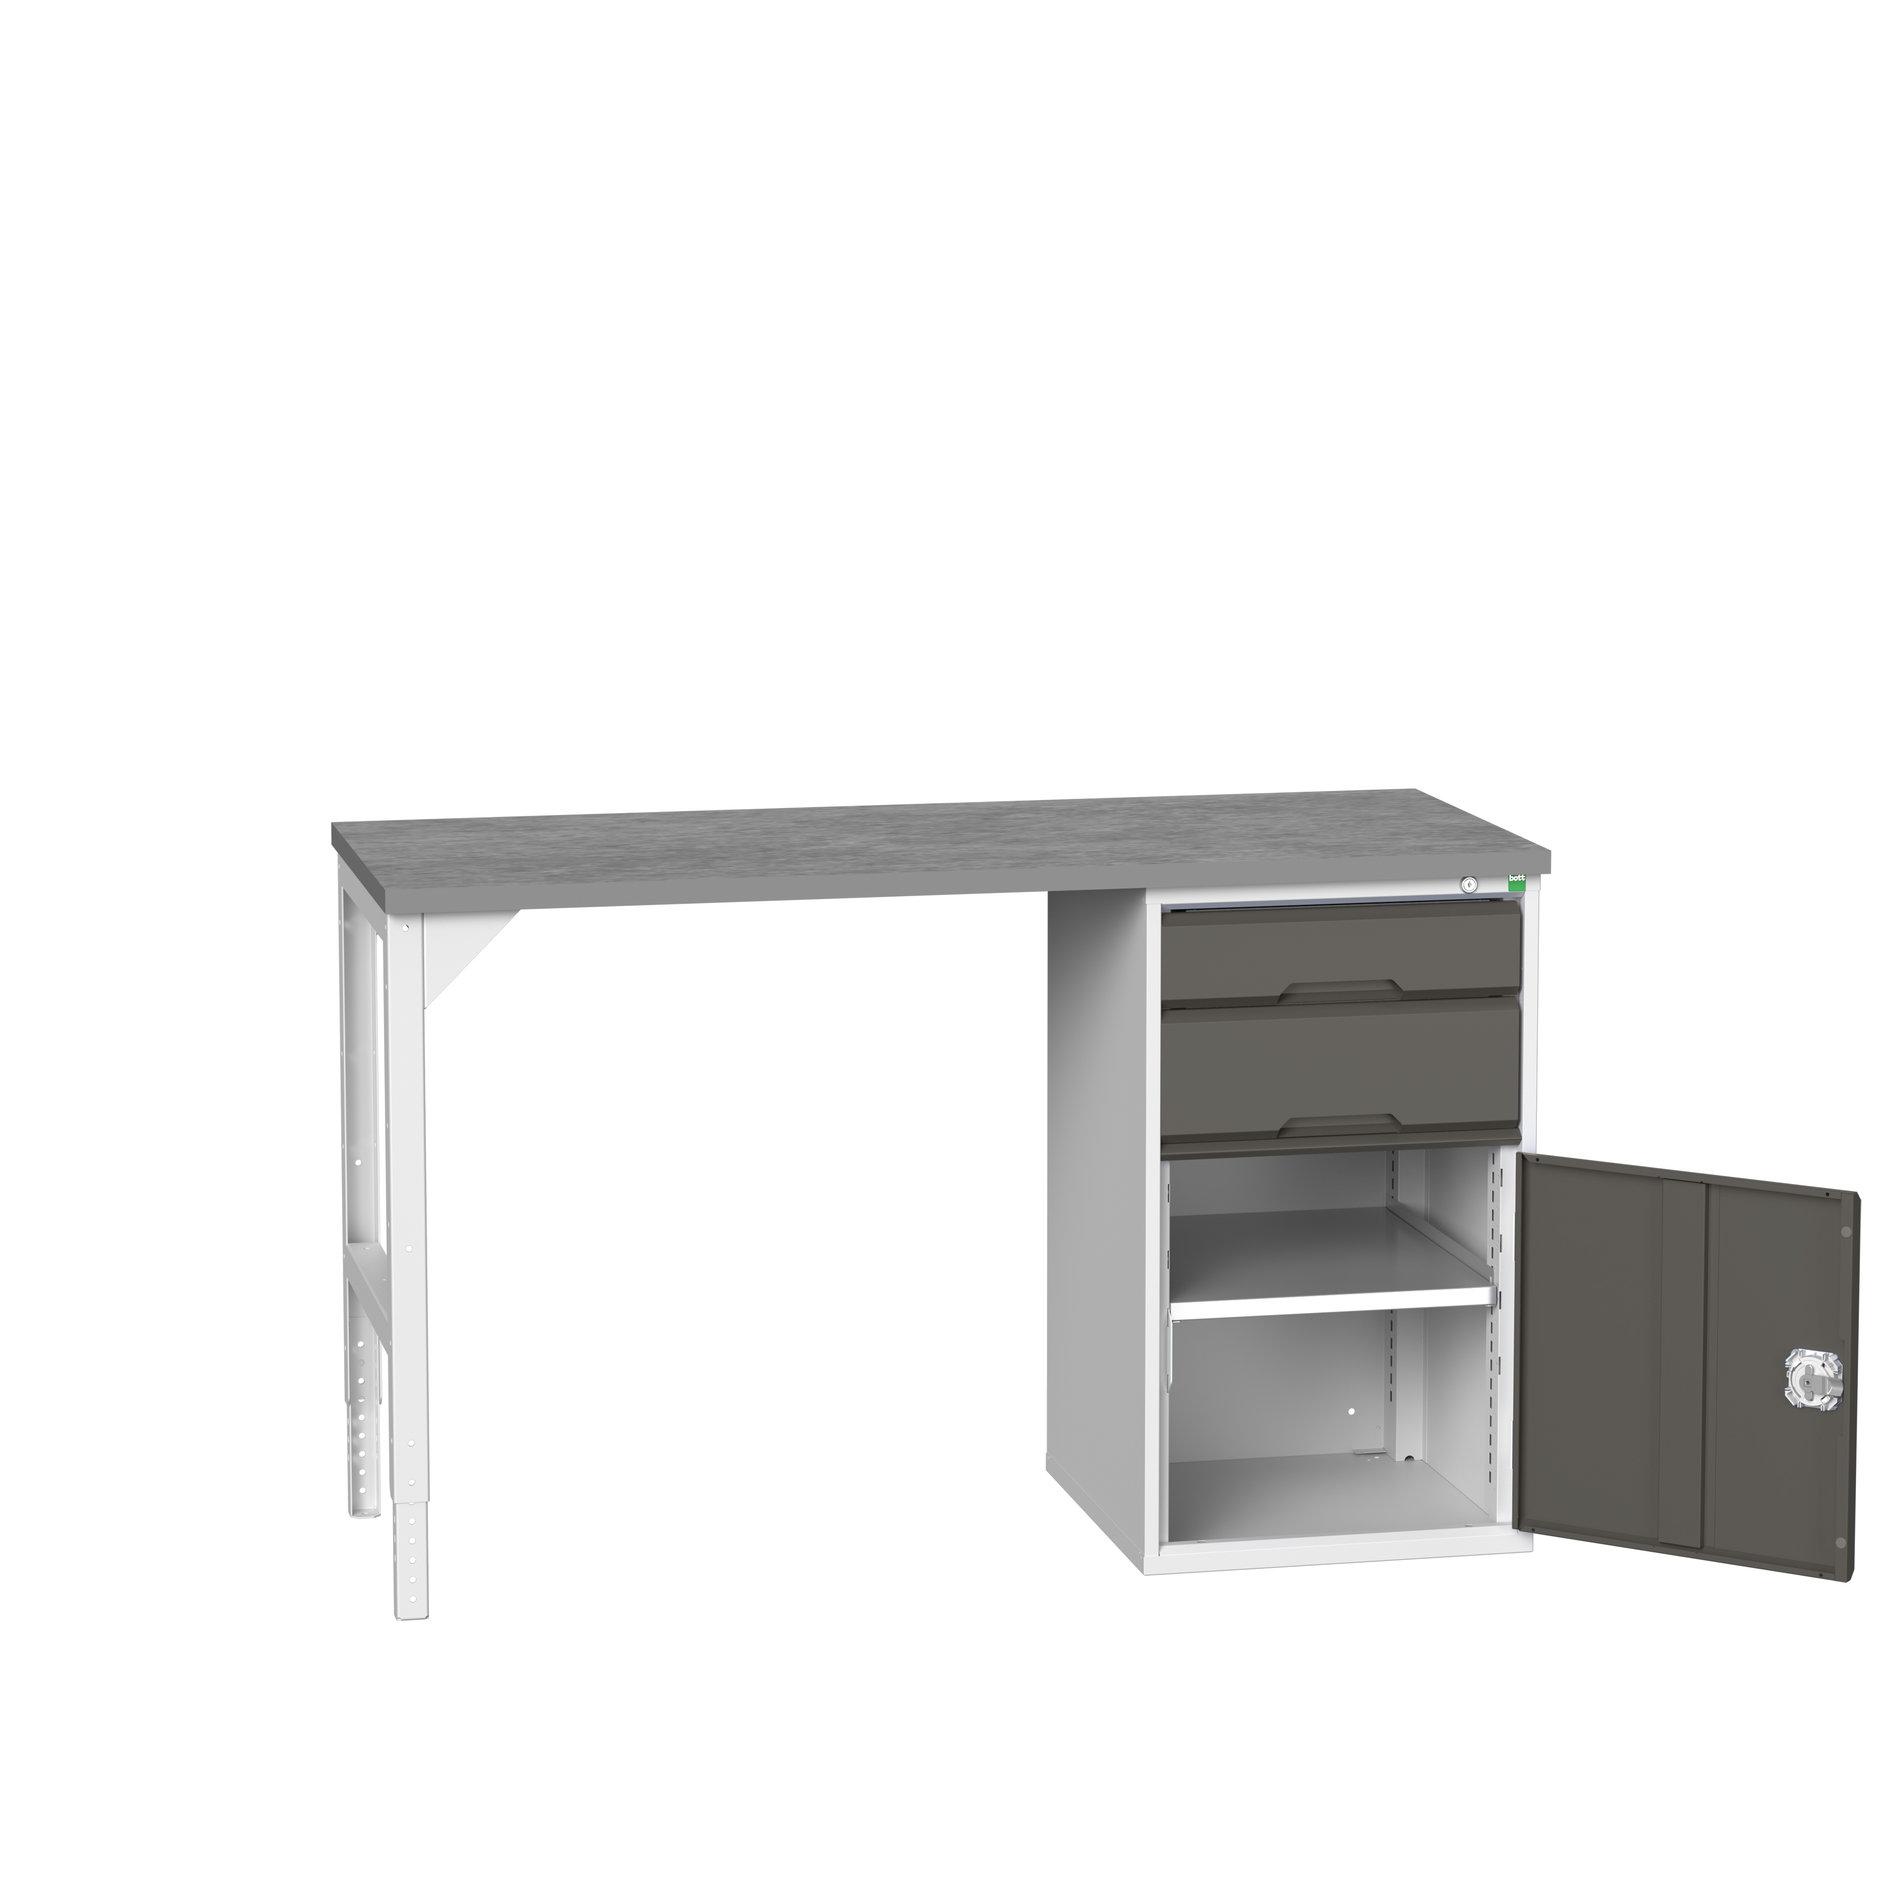 Bott Verso Pedestal Bench With 2 Drawer-Door Cabinet